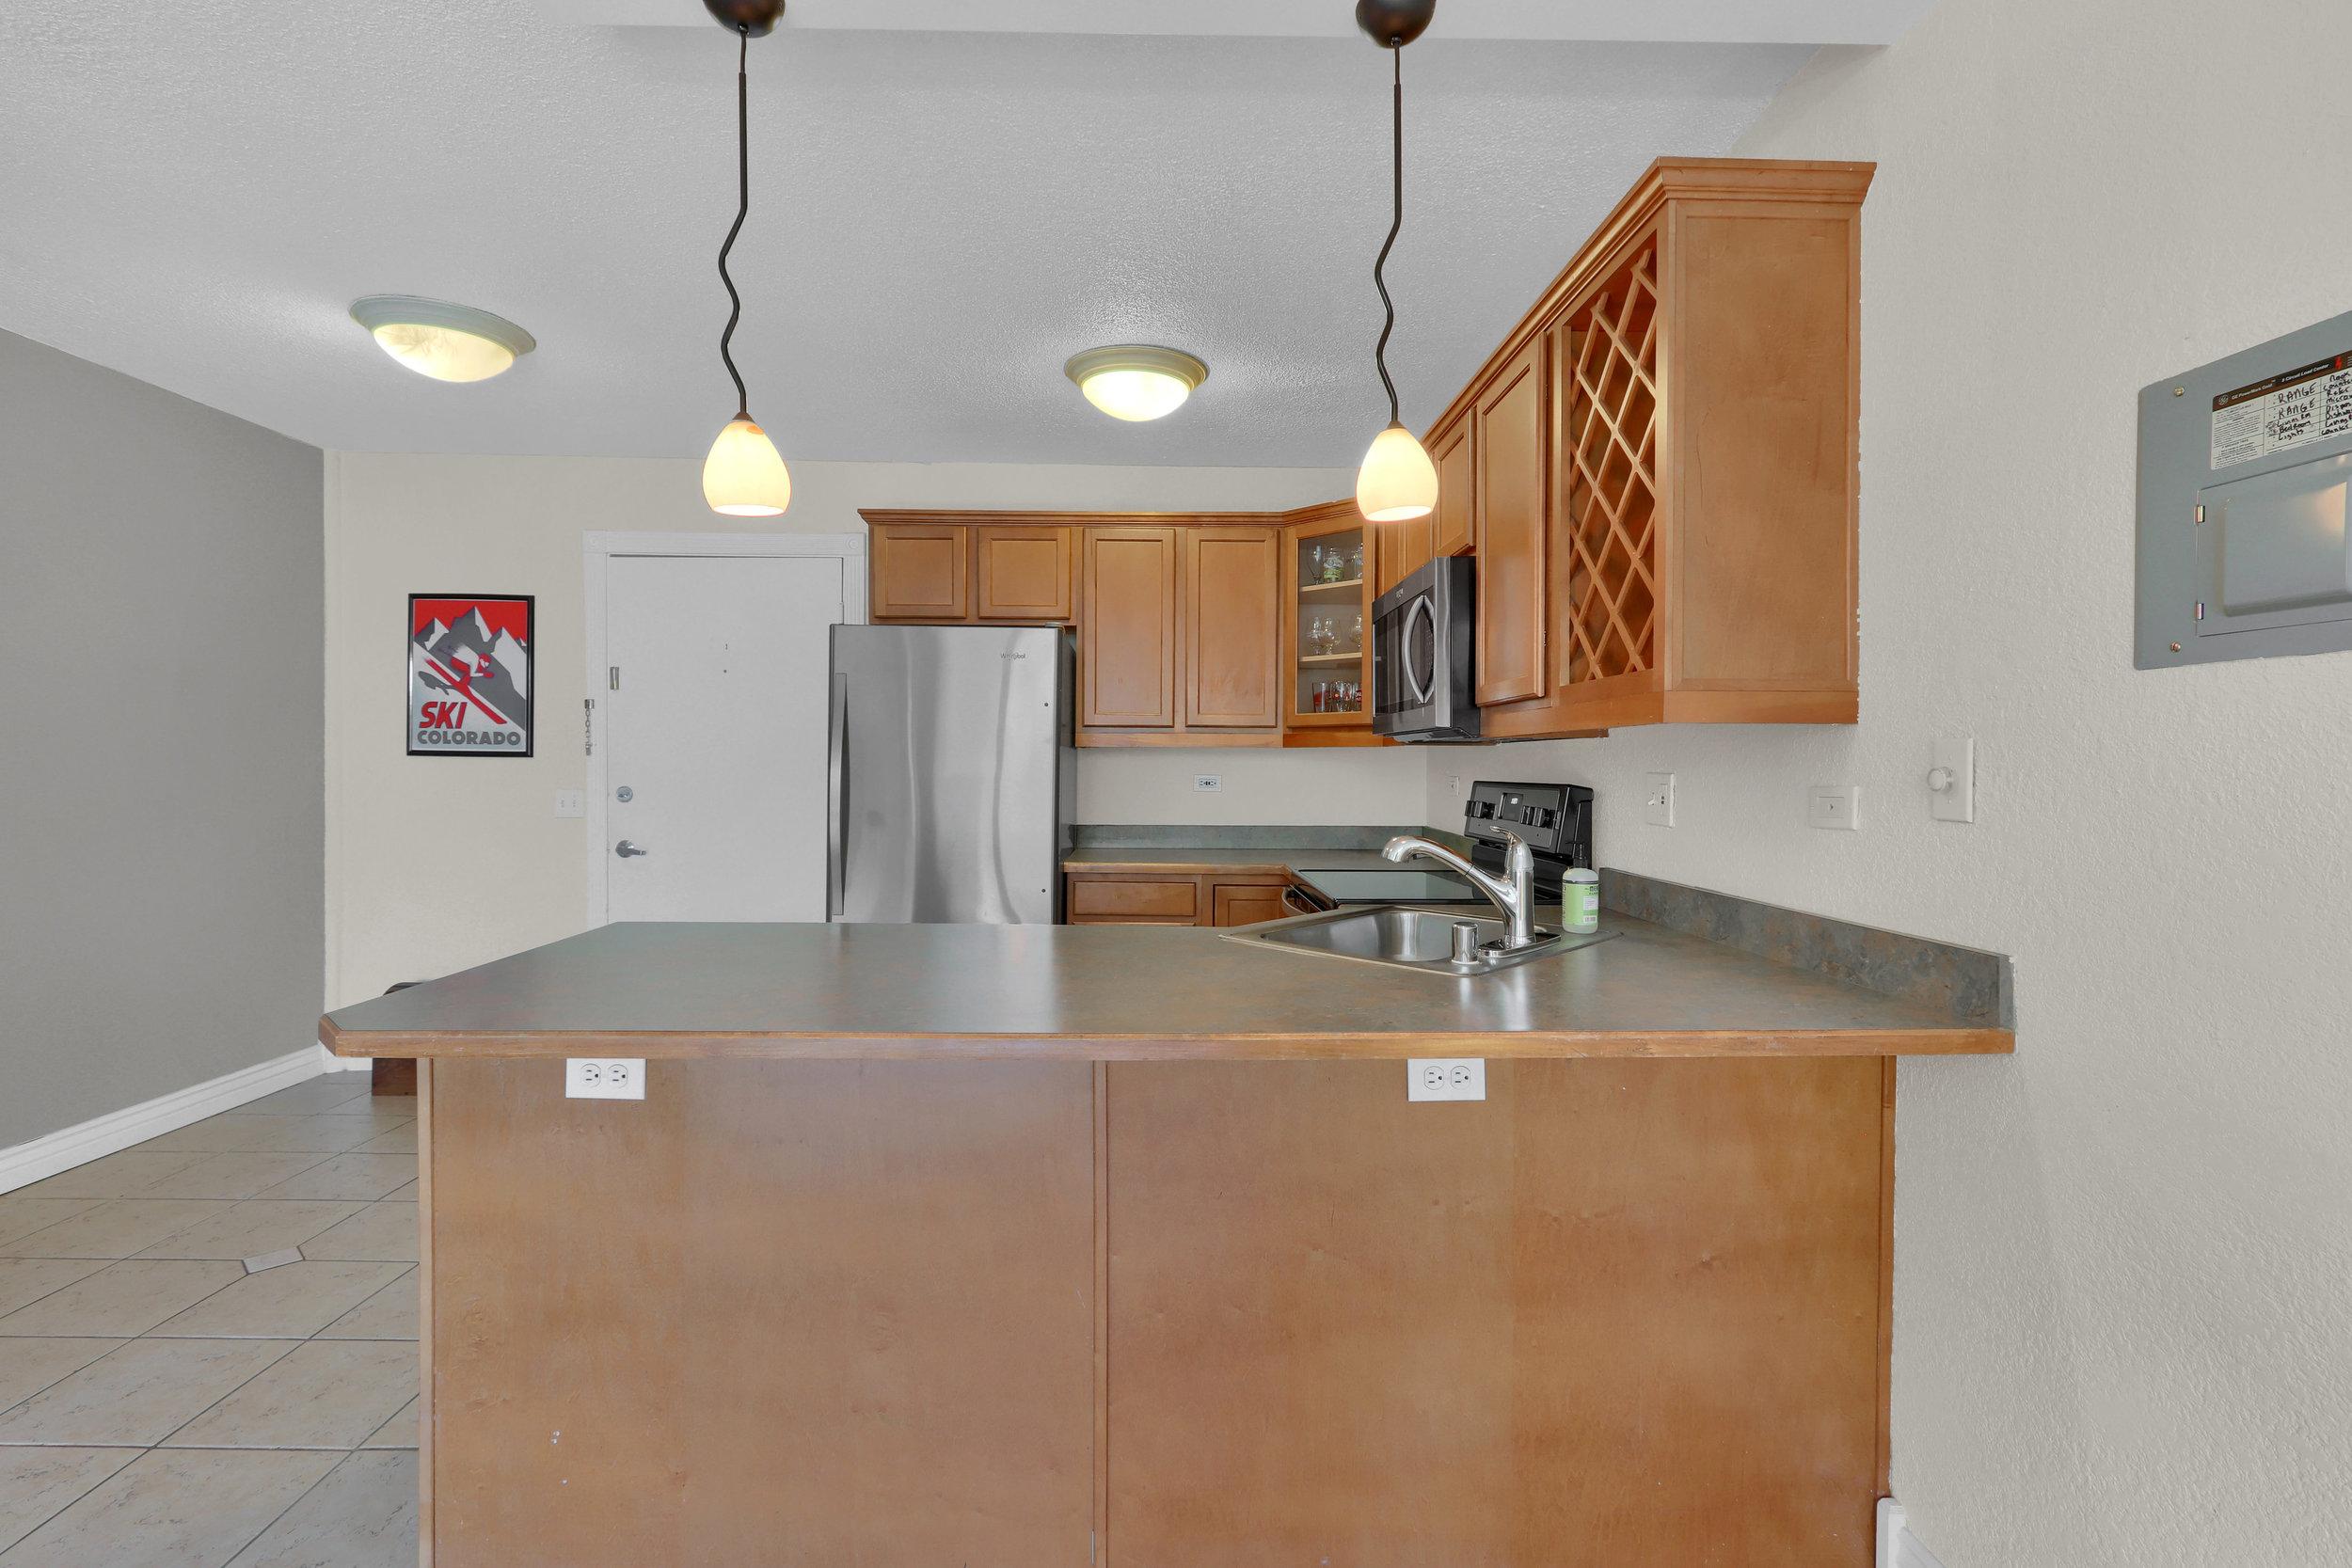 909 N Logan St Unit 3J Denver-print-006-002-Kitchen-4200x2800-300dpi.jpg